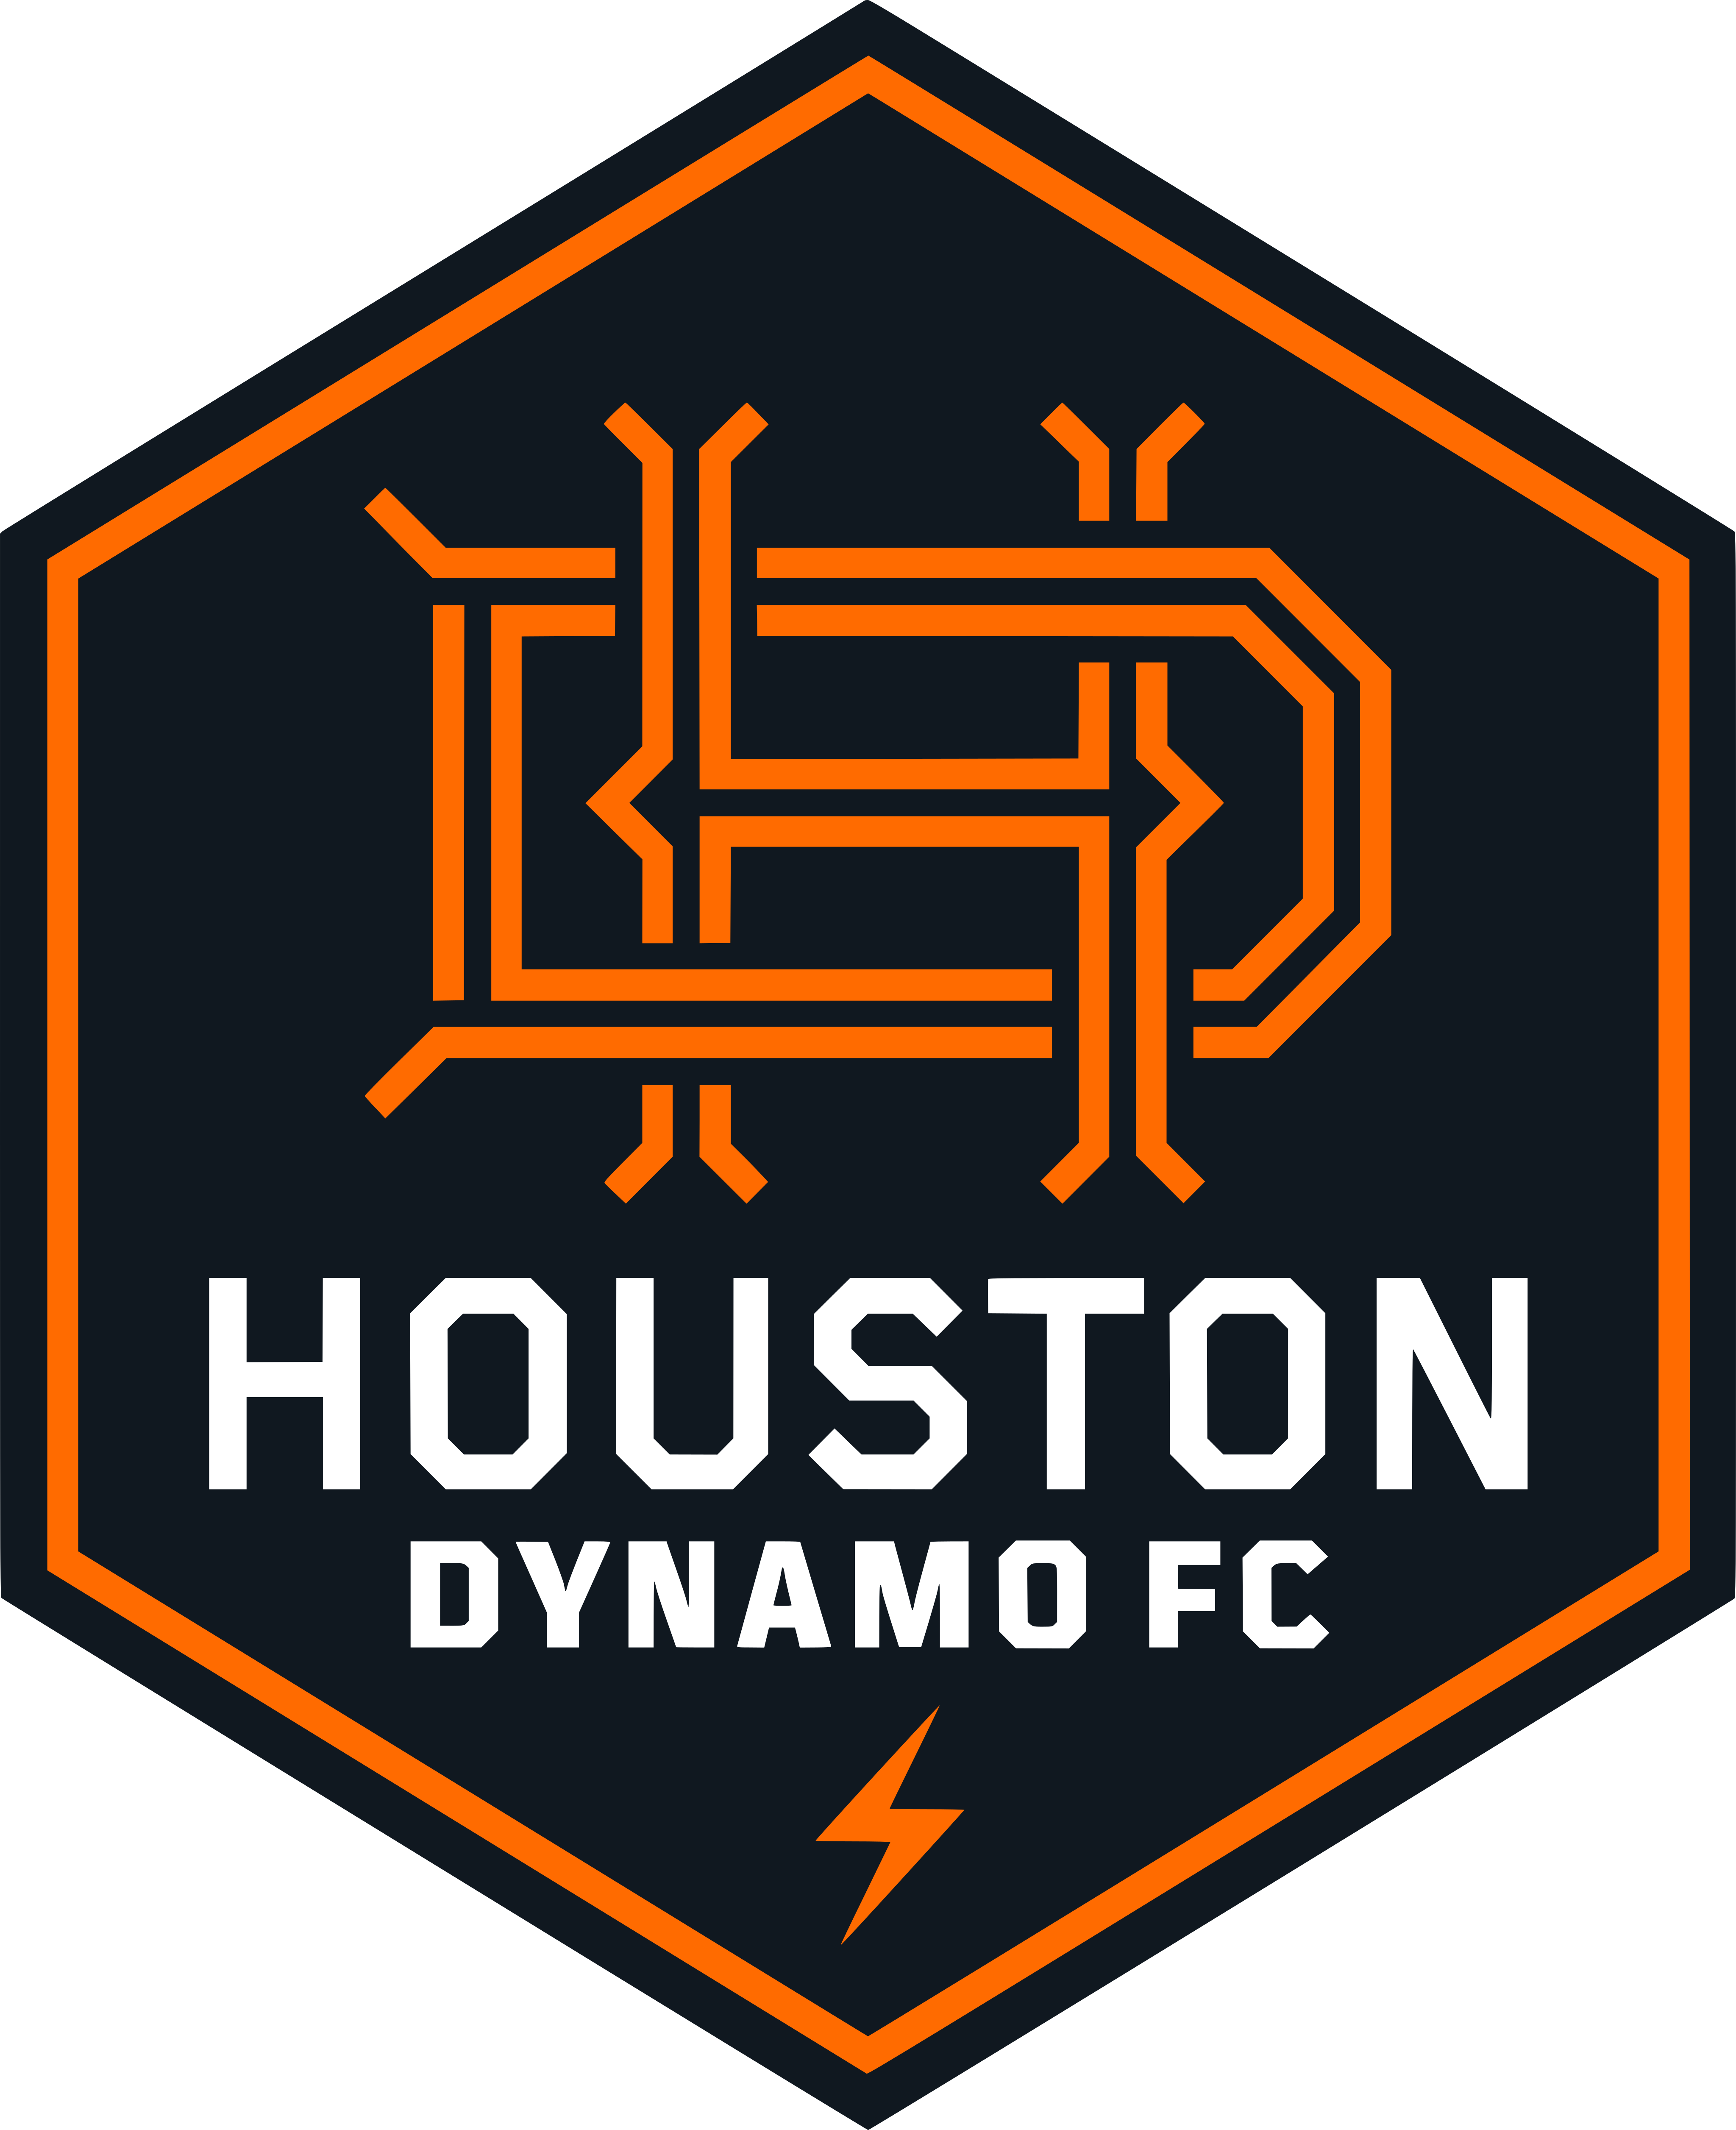 houston dynamo fc logo - Houston Dynamo Logo